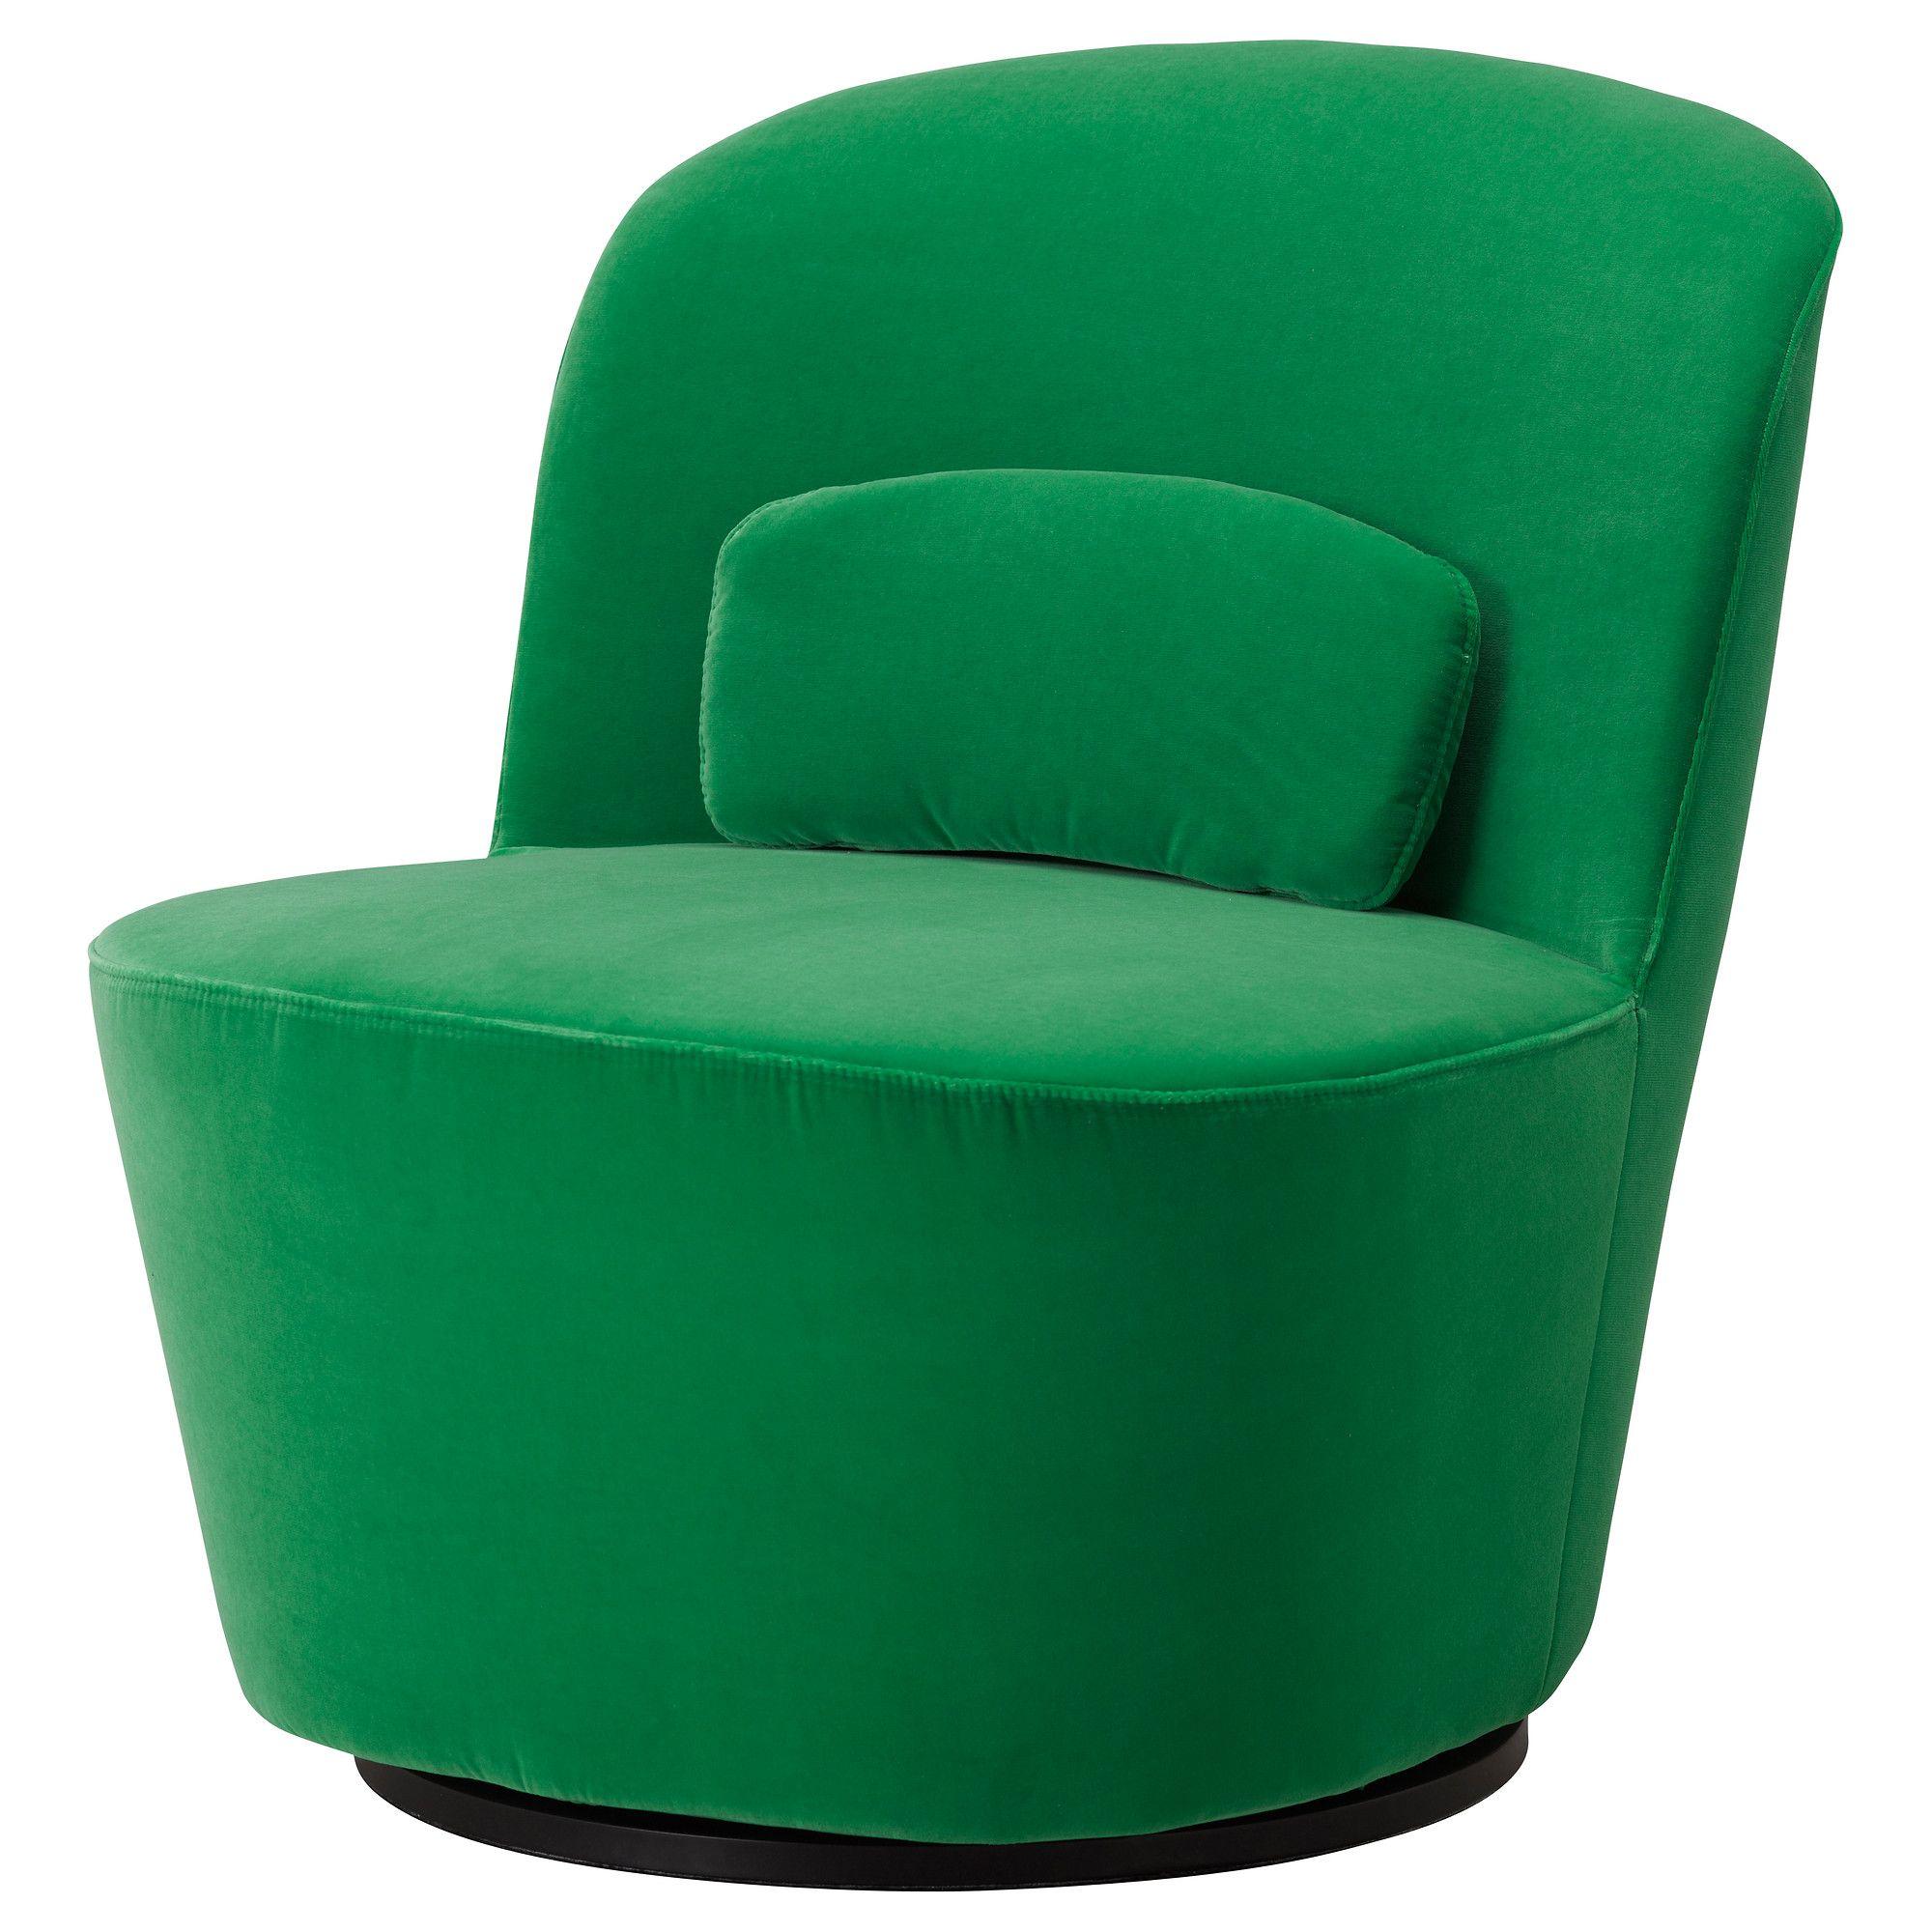 US Furniture and Home Furnishings Ikea, Ikea stockholm